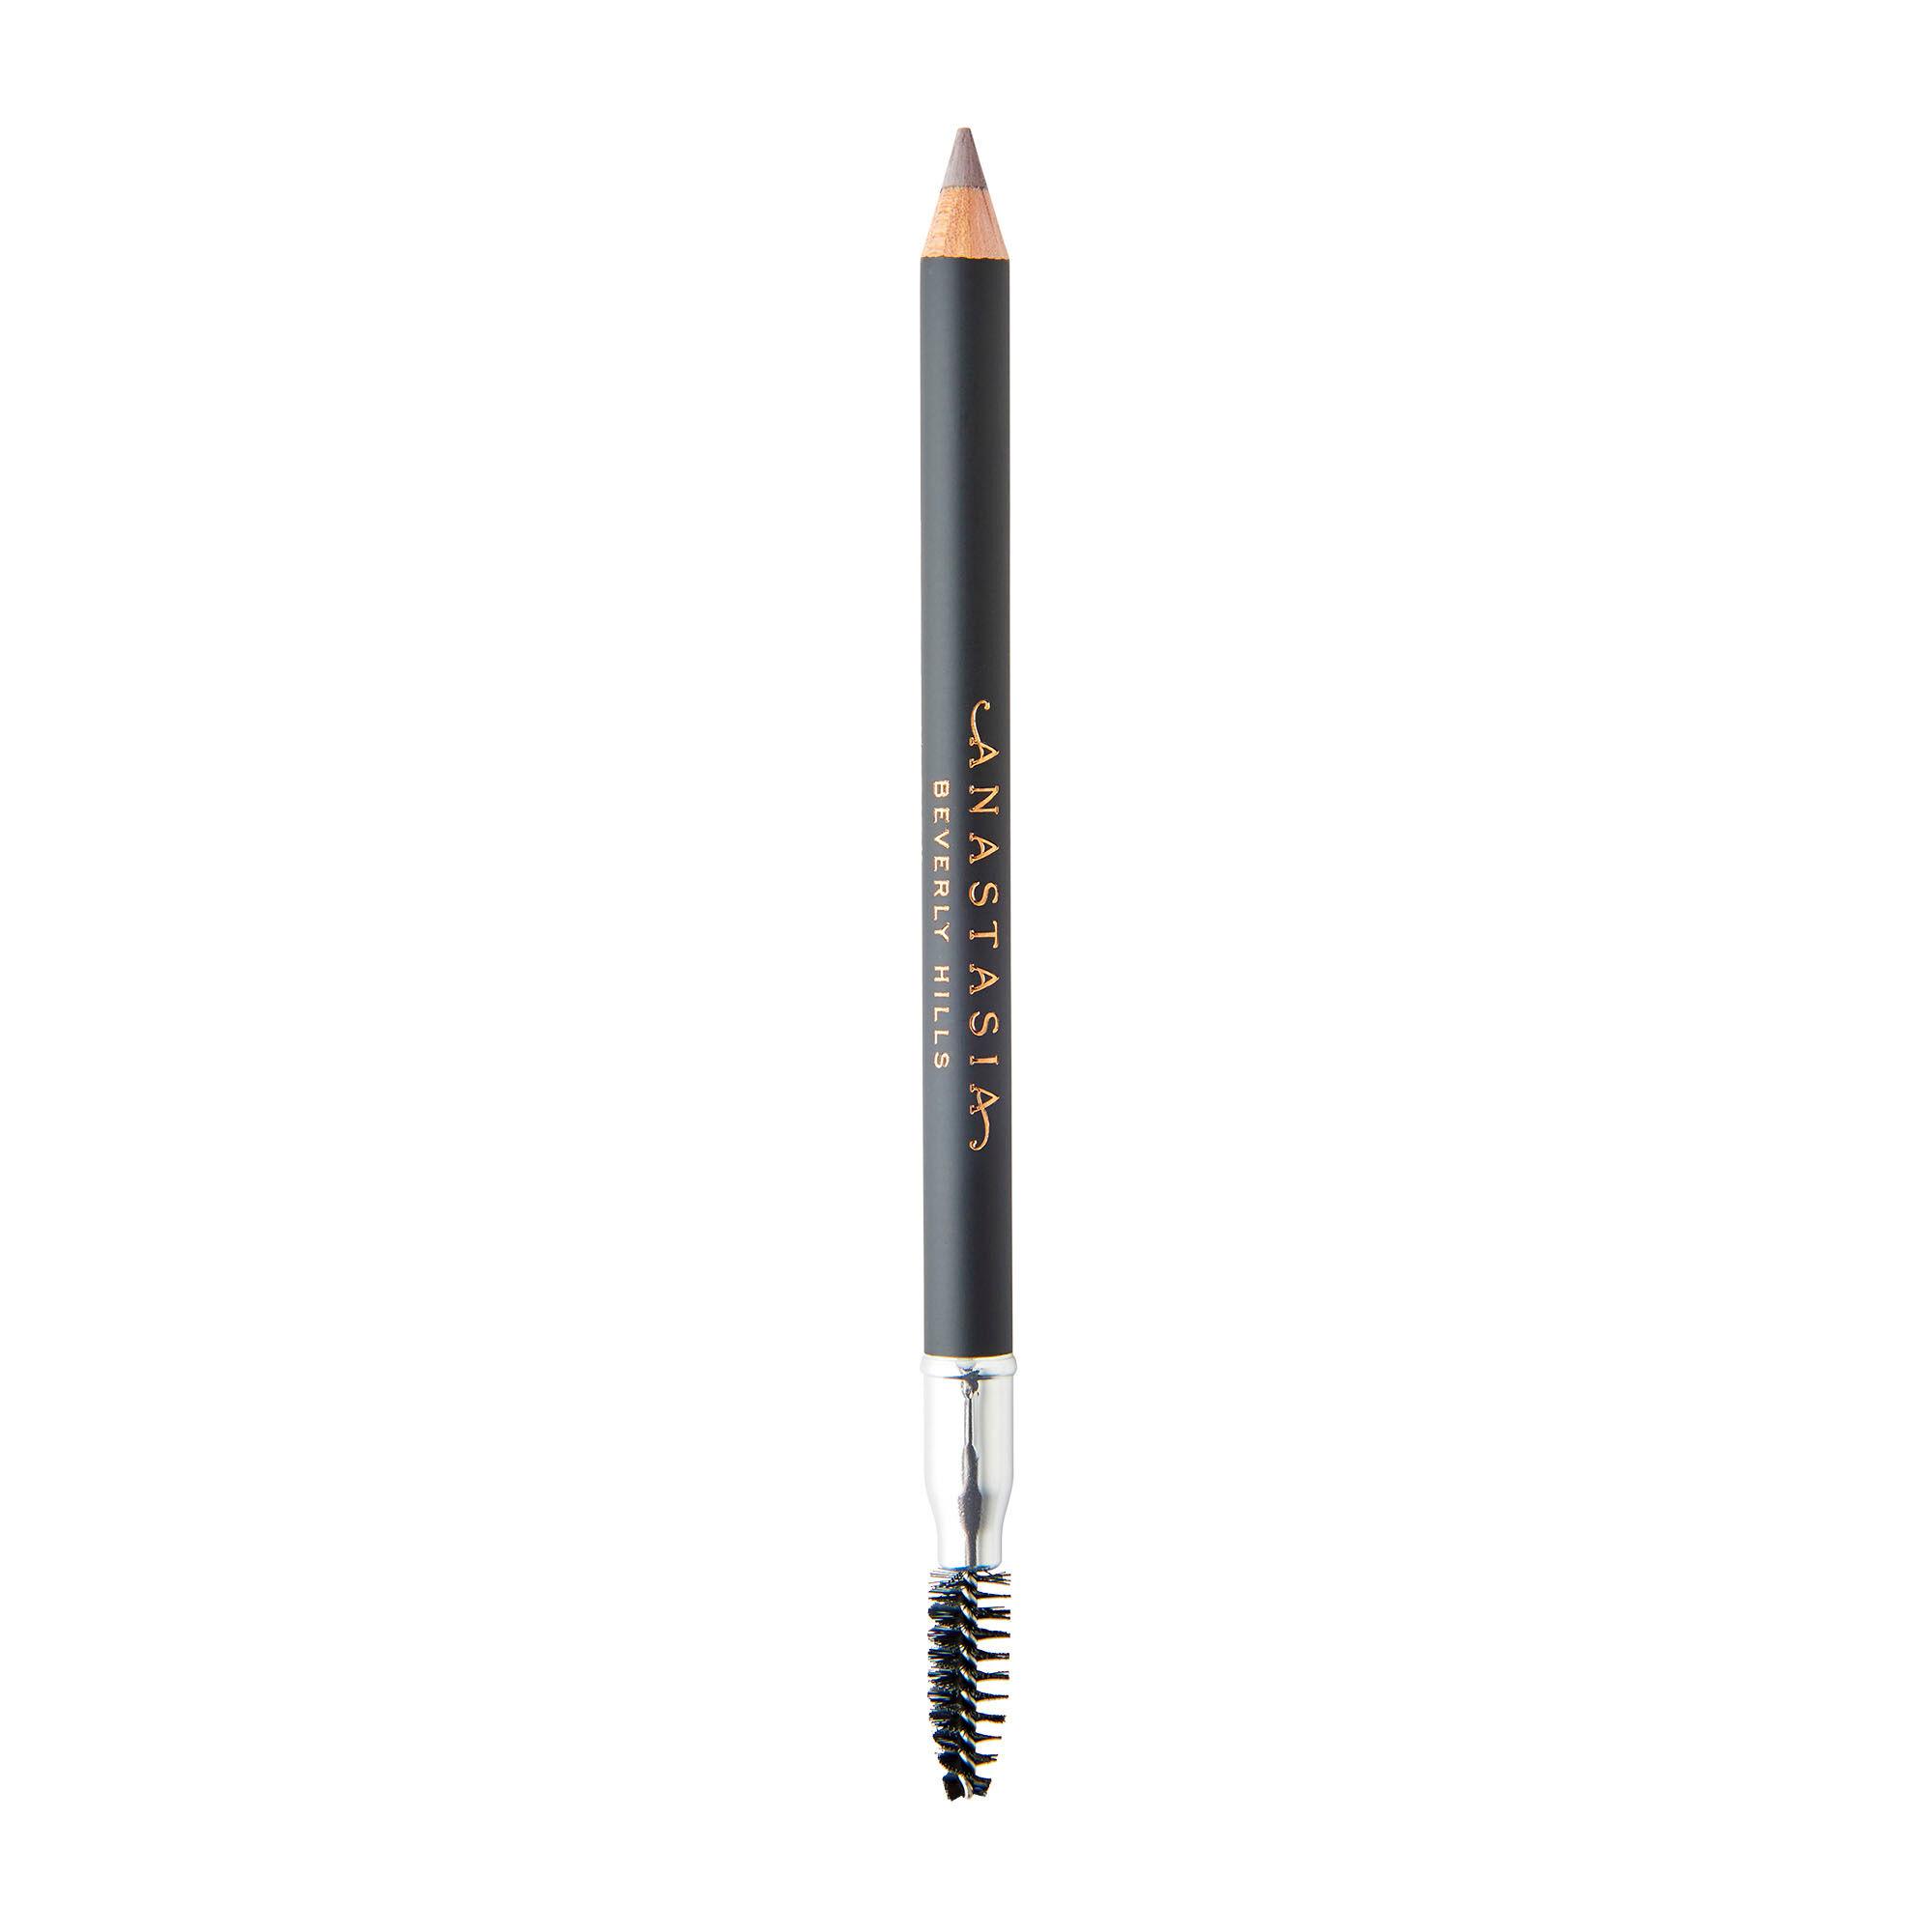 Anastasia Beverly Hills Crayon Perfect Brow Pencil Auburn Auburn 1.05g